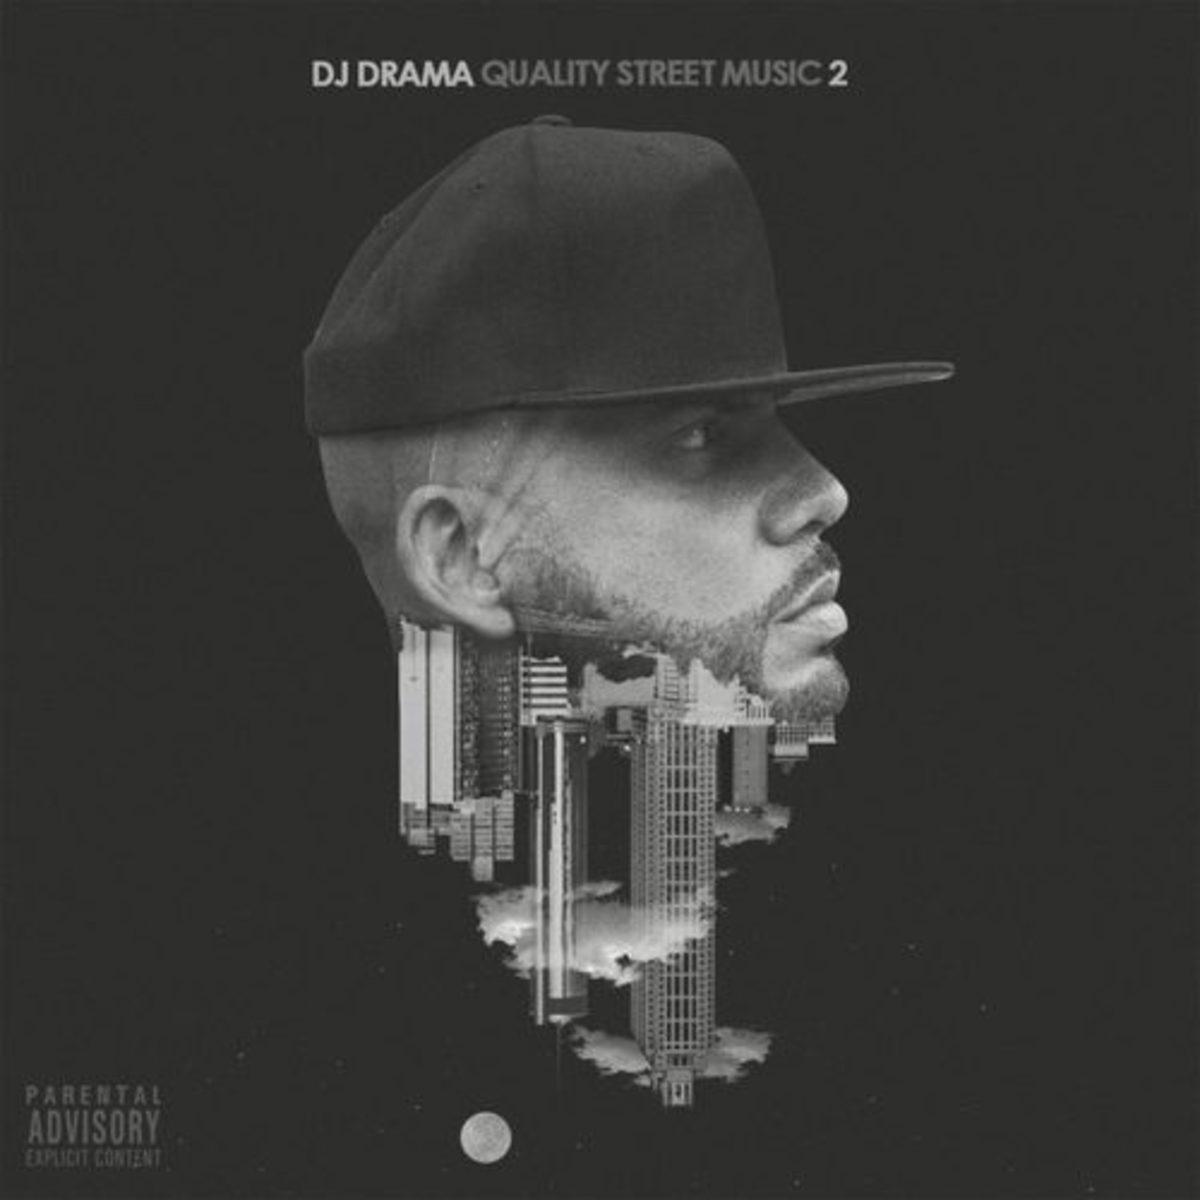 dj-drama-quality-street-music-2.jpg